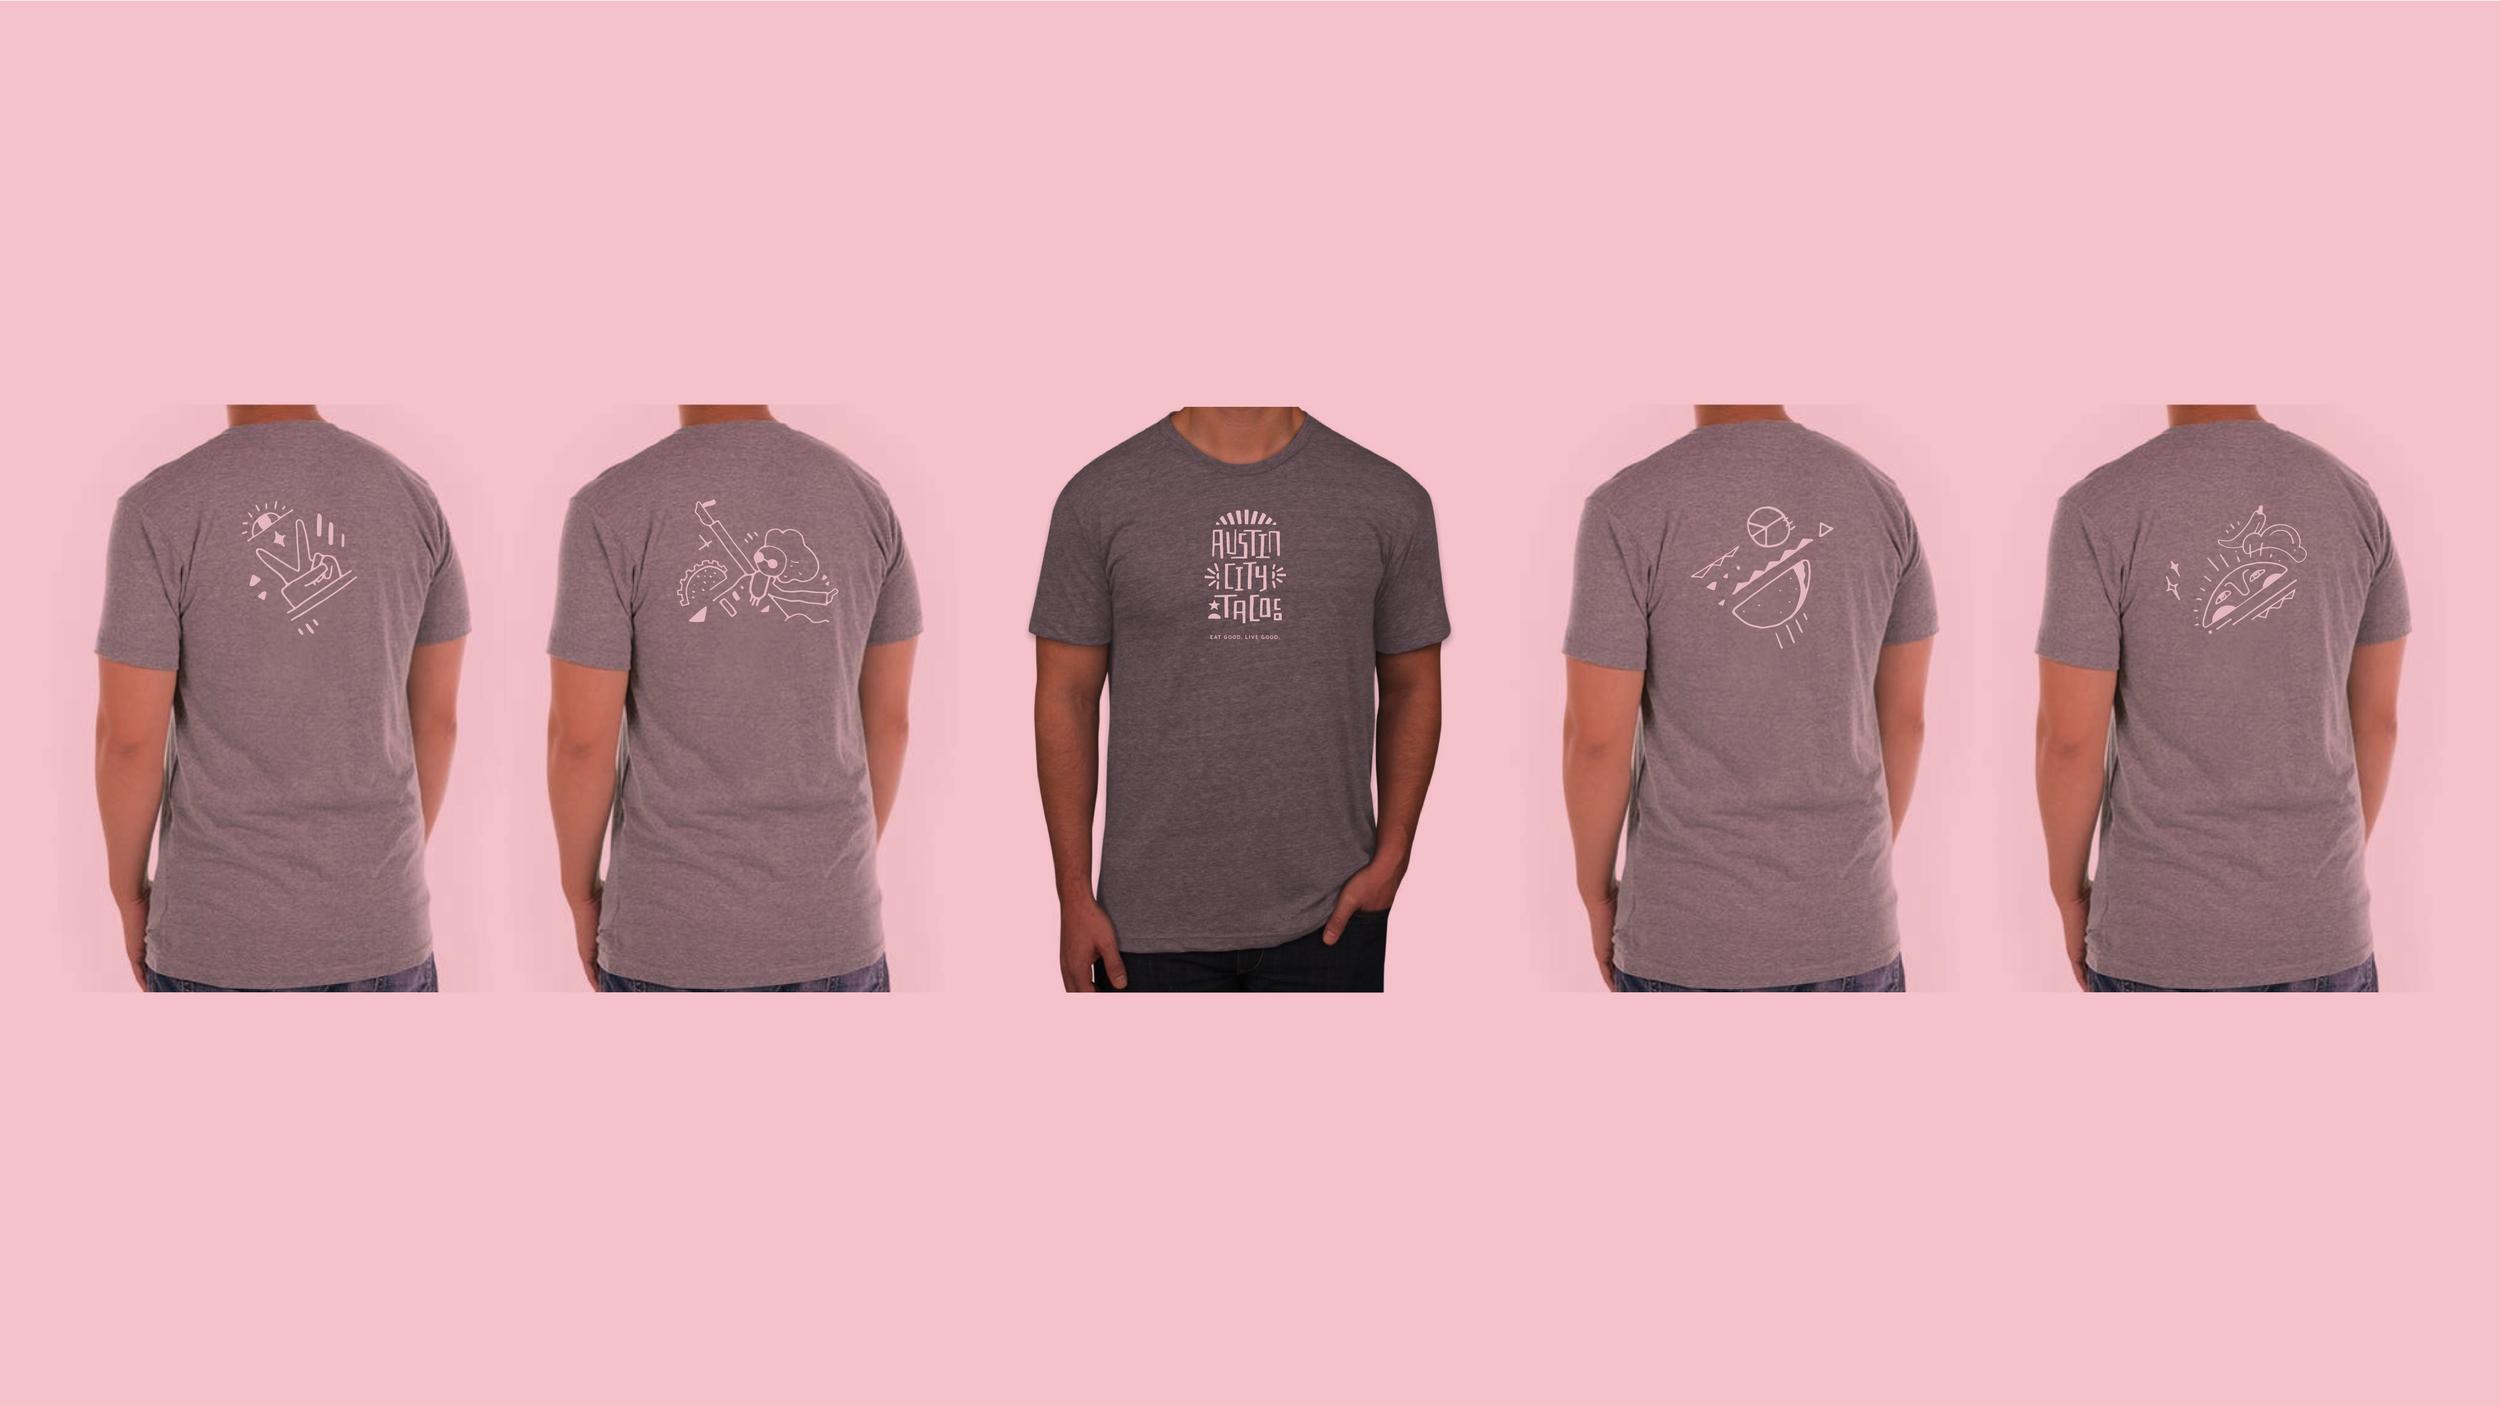 Tshirts-01.png